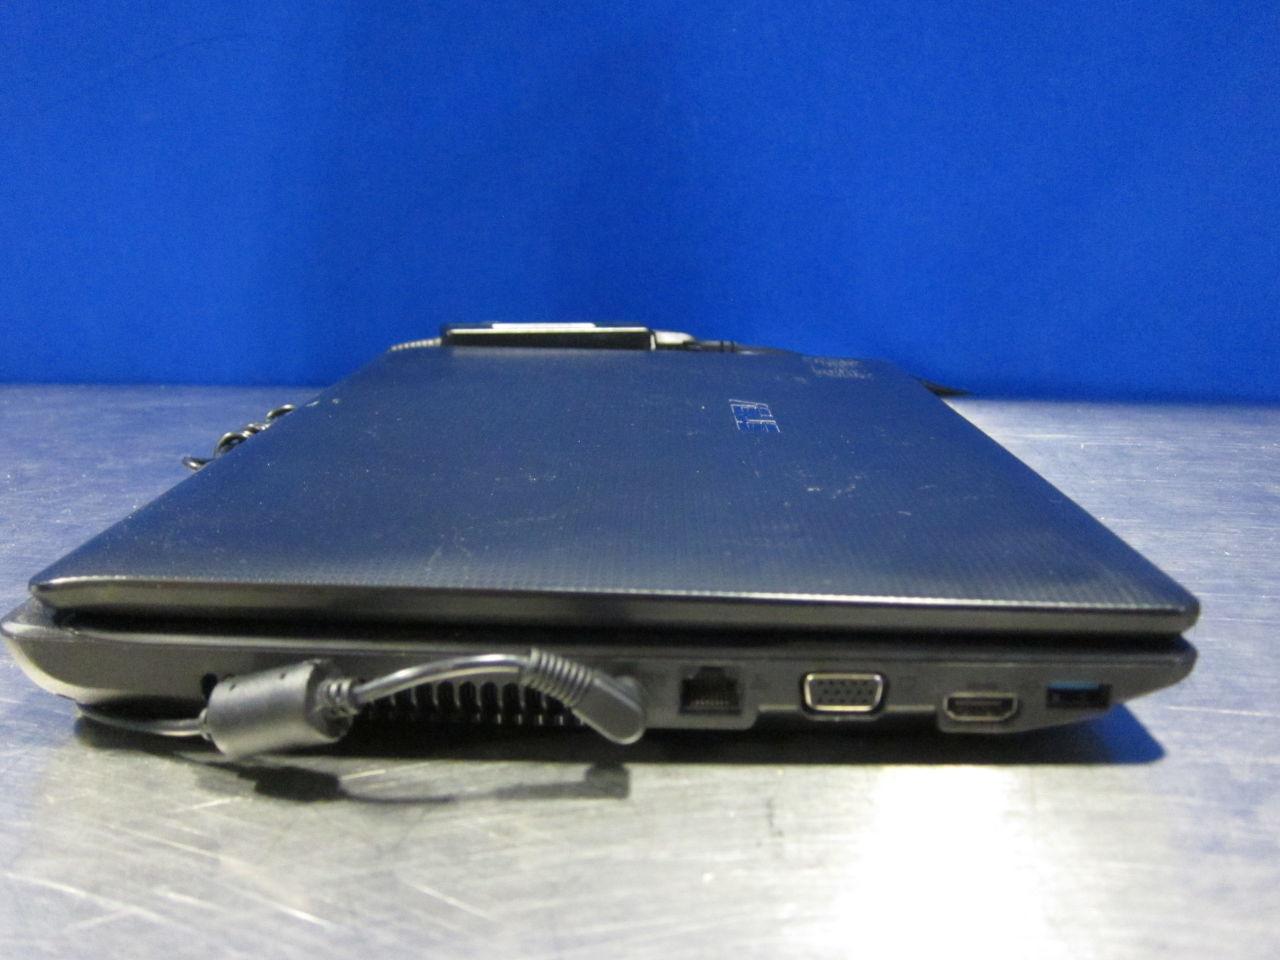 ASUS K54C Computer